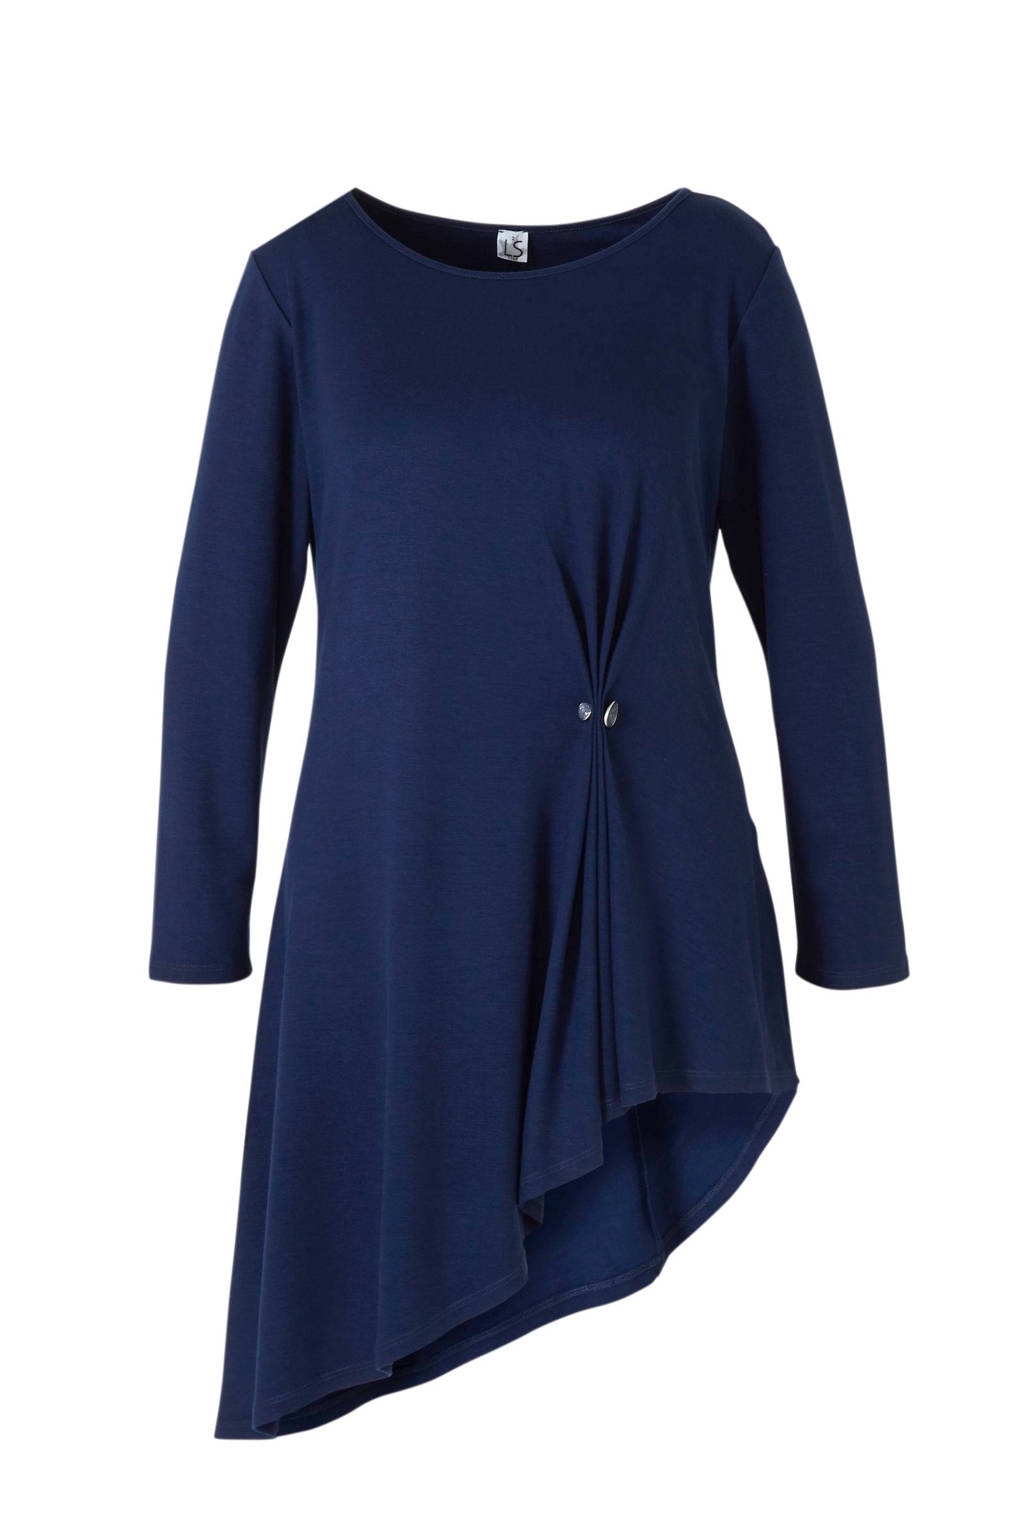 La Stampa jurk blauw, Blauw